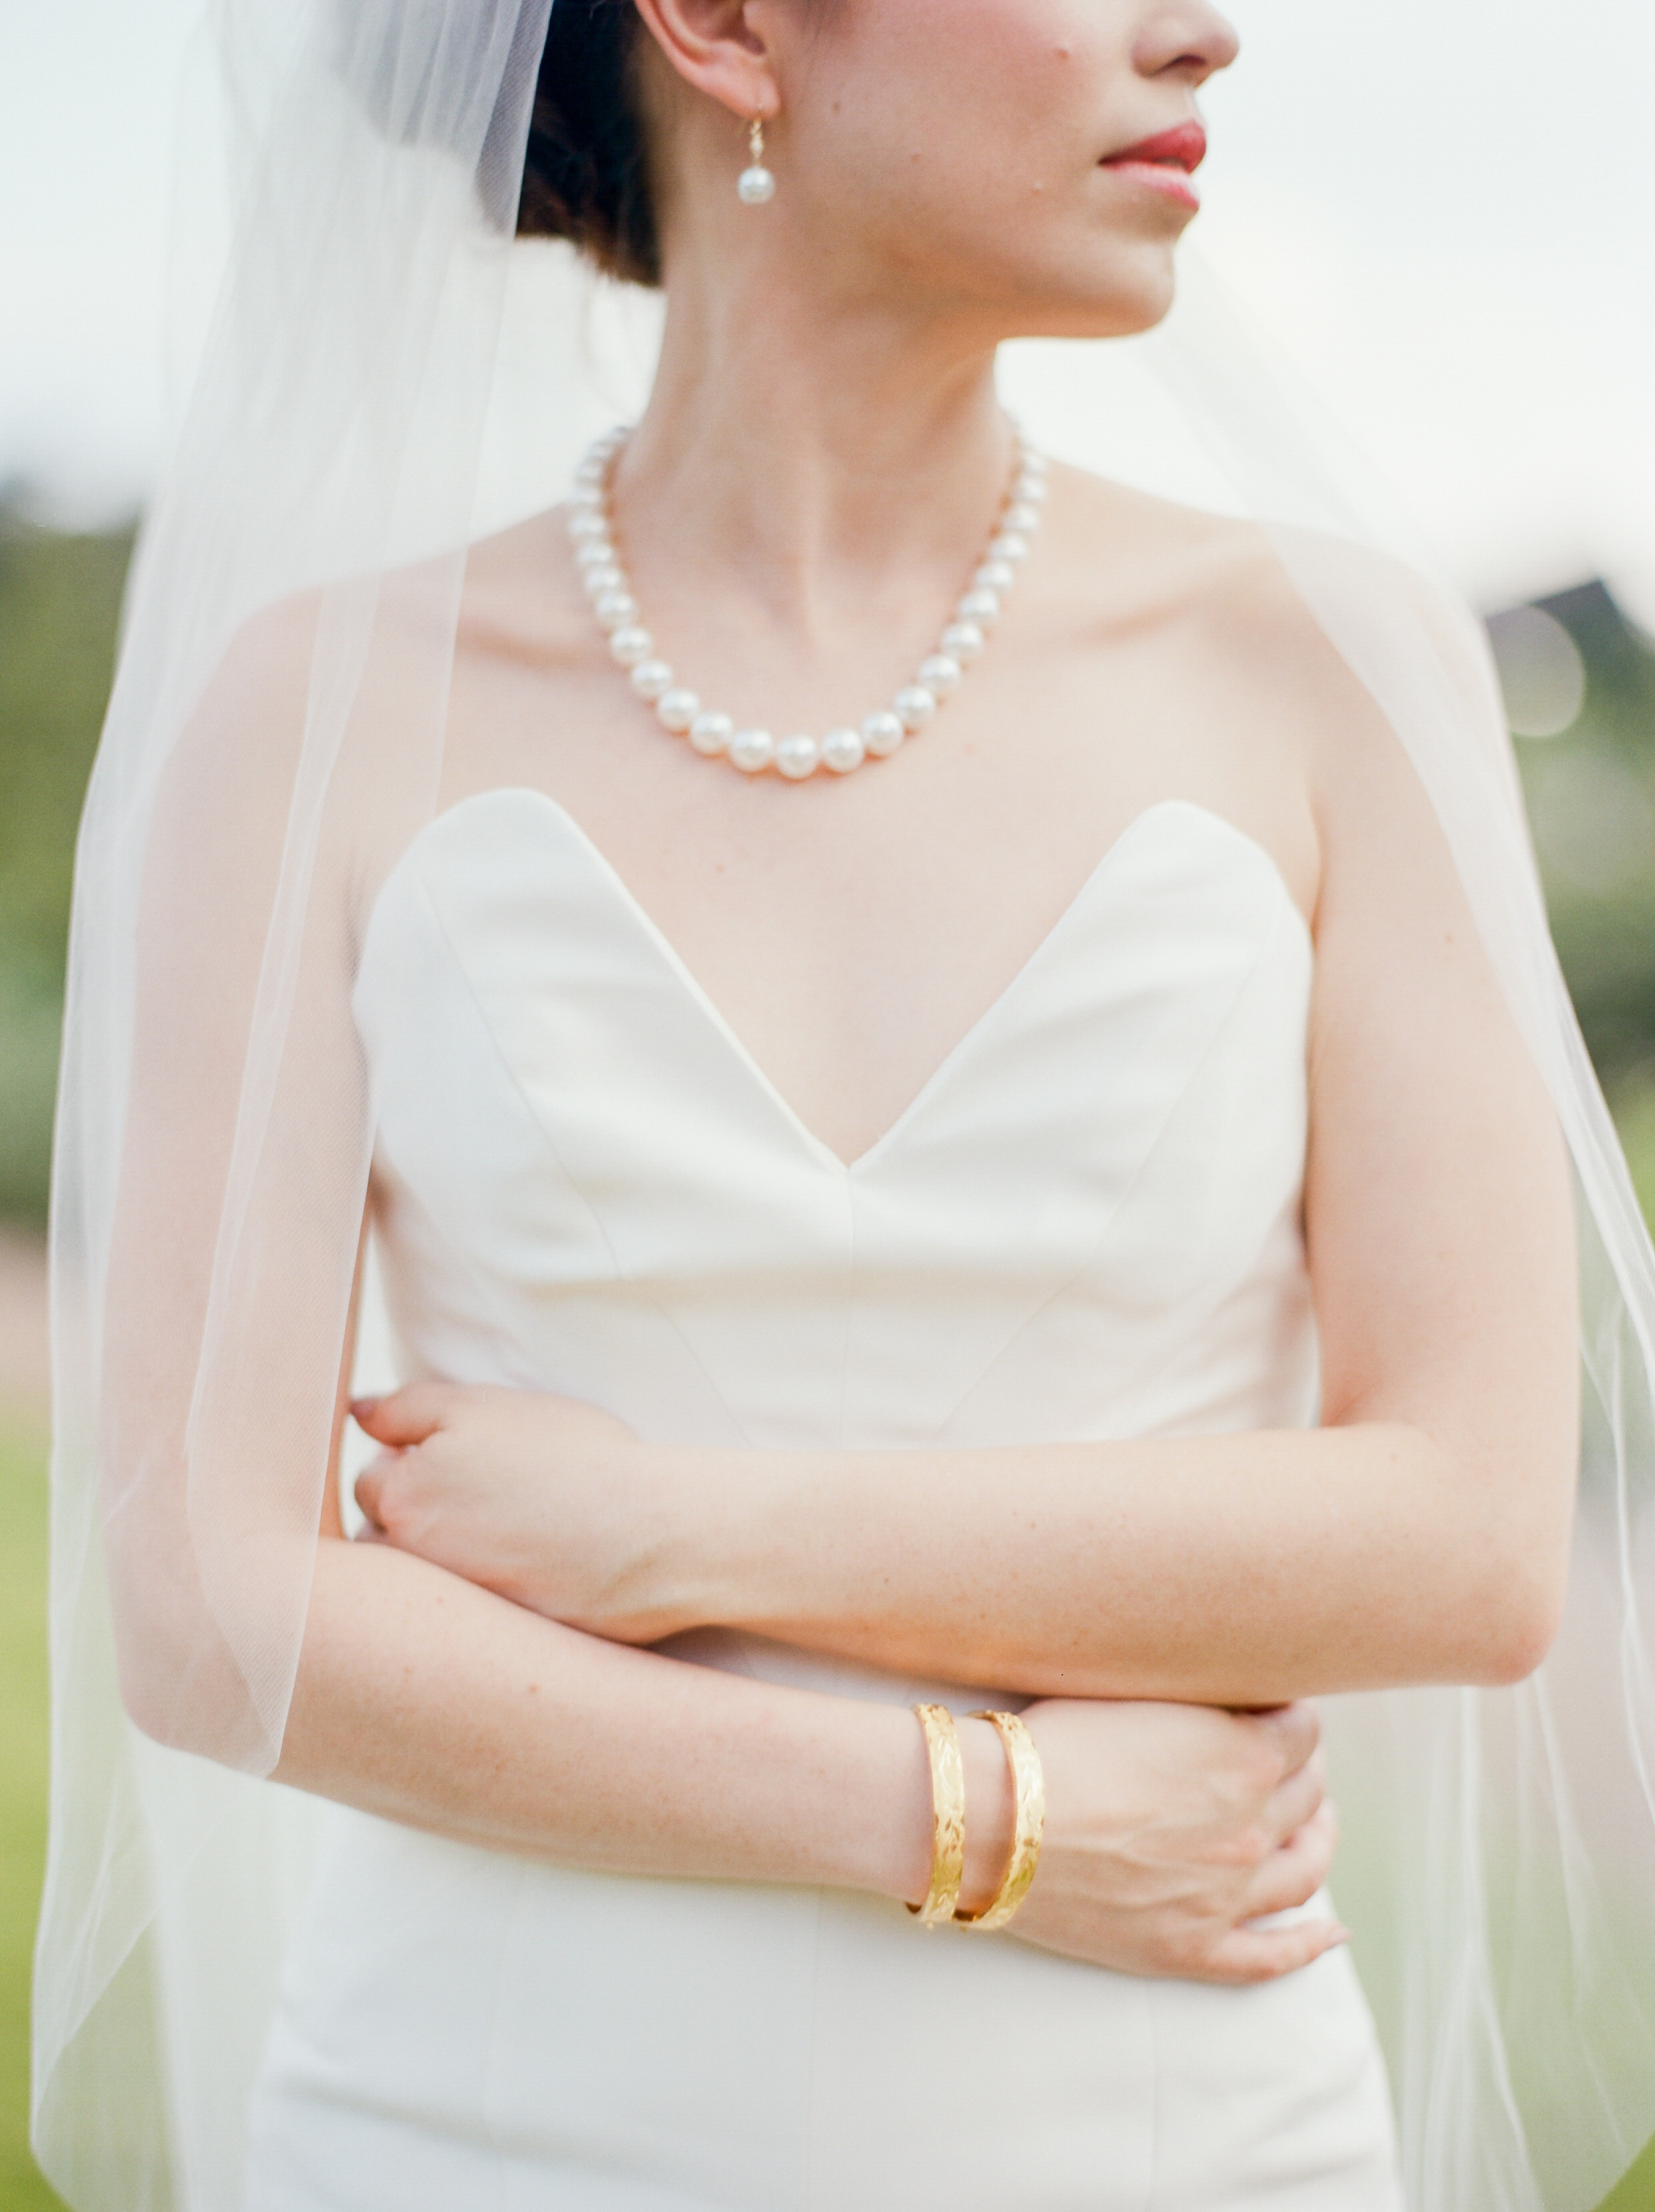 mcgovern-centennial-gardens-wedding-houston-wedding-photographer-bridals-film-austin-wedding-photographer-2.jpg